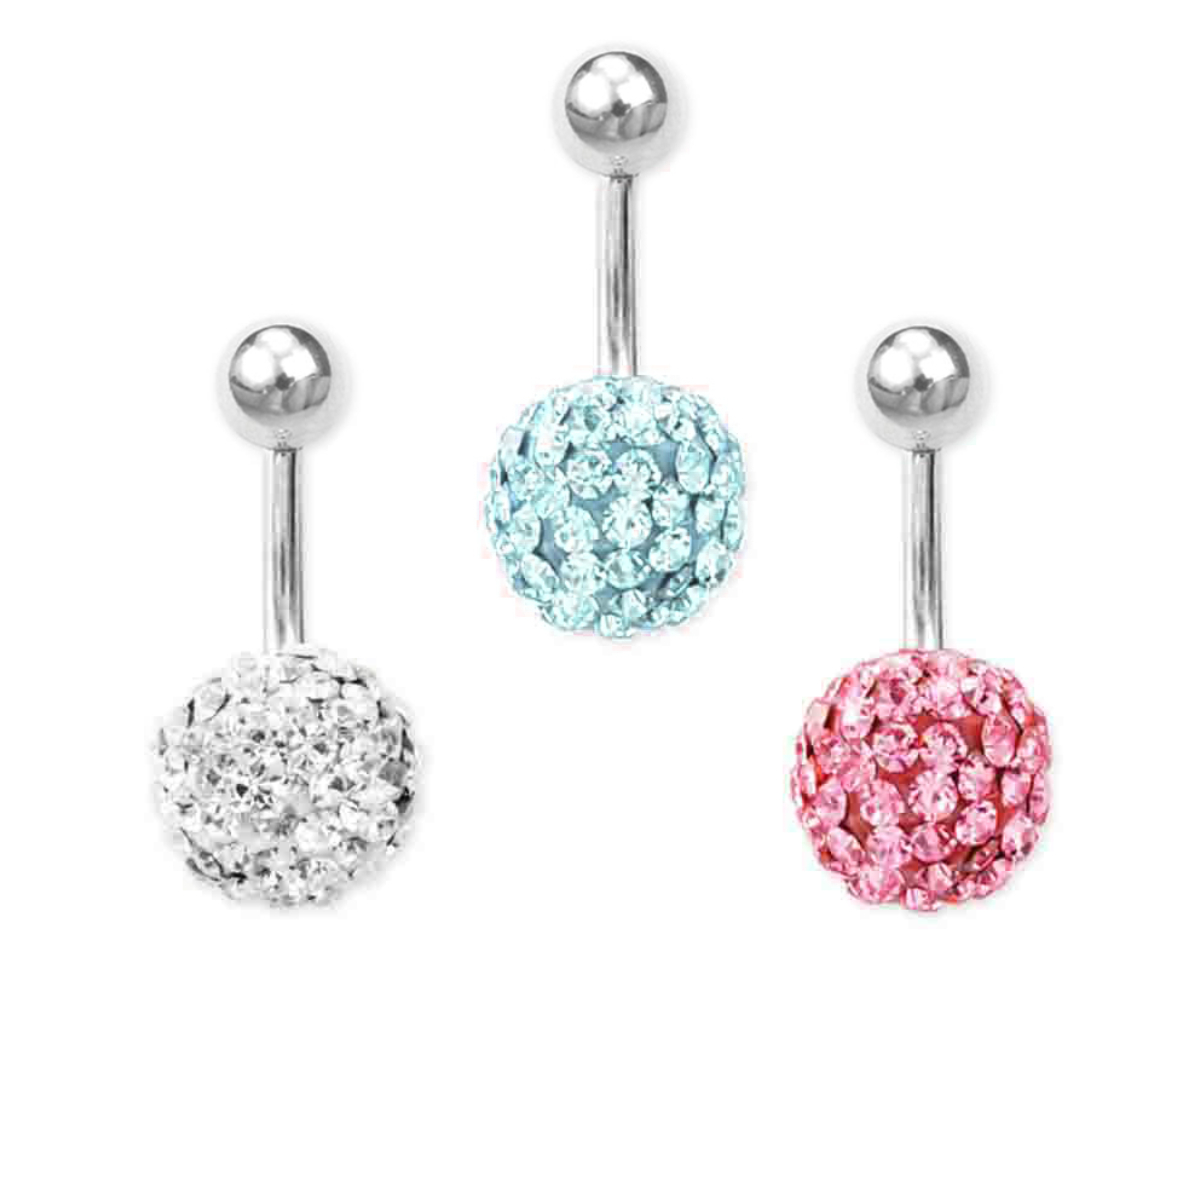 Fehér kristályos gömb orvosi acél piercing